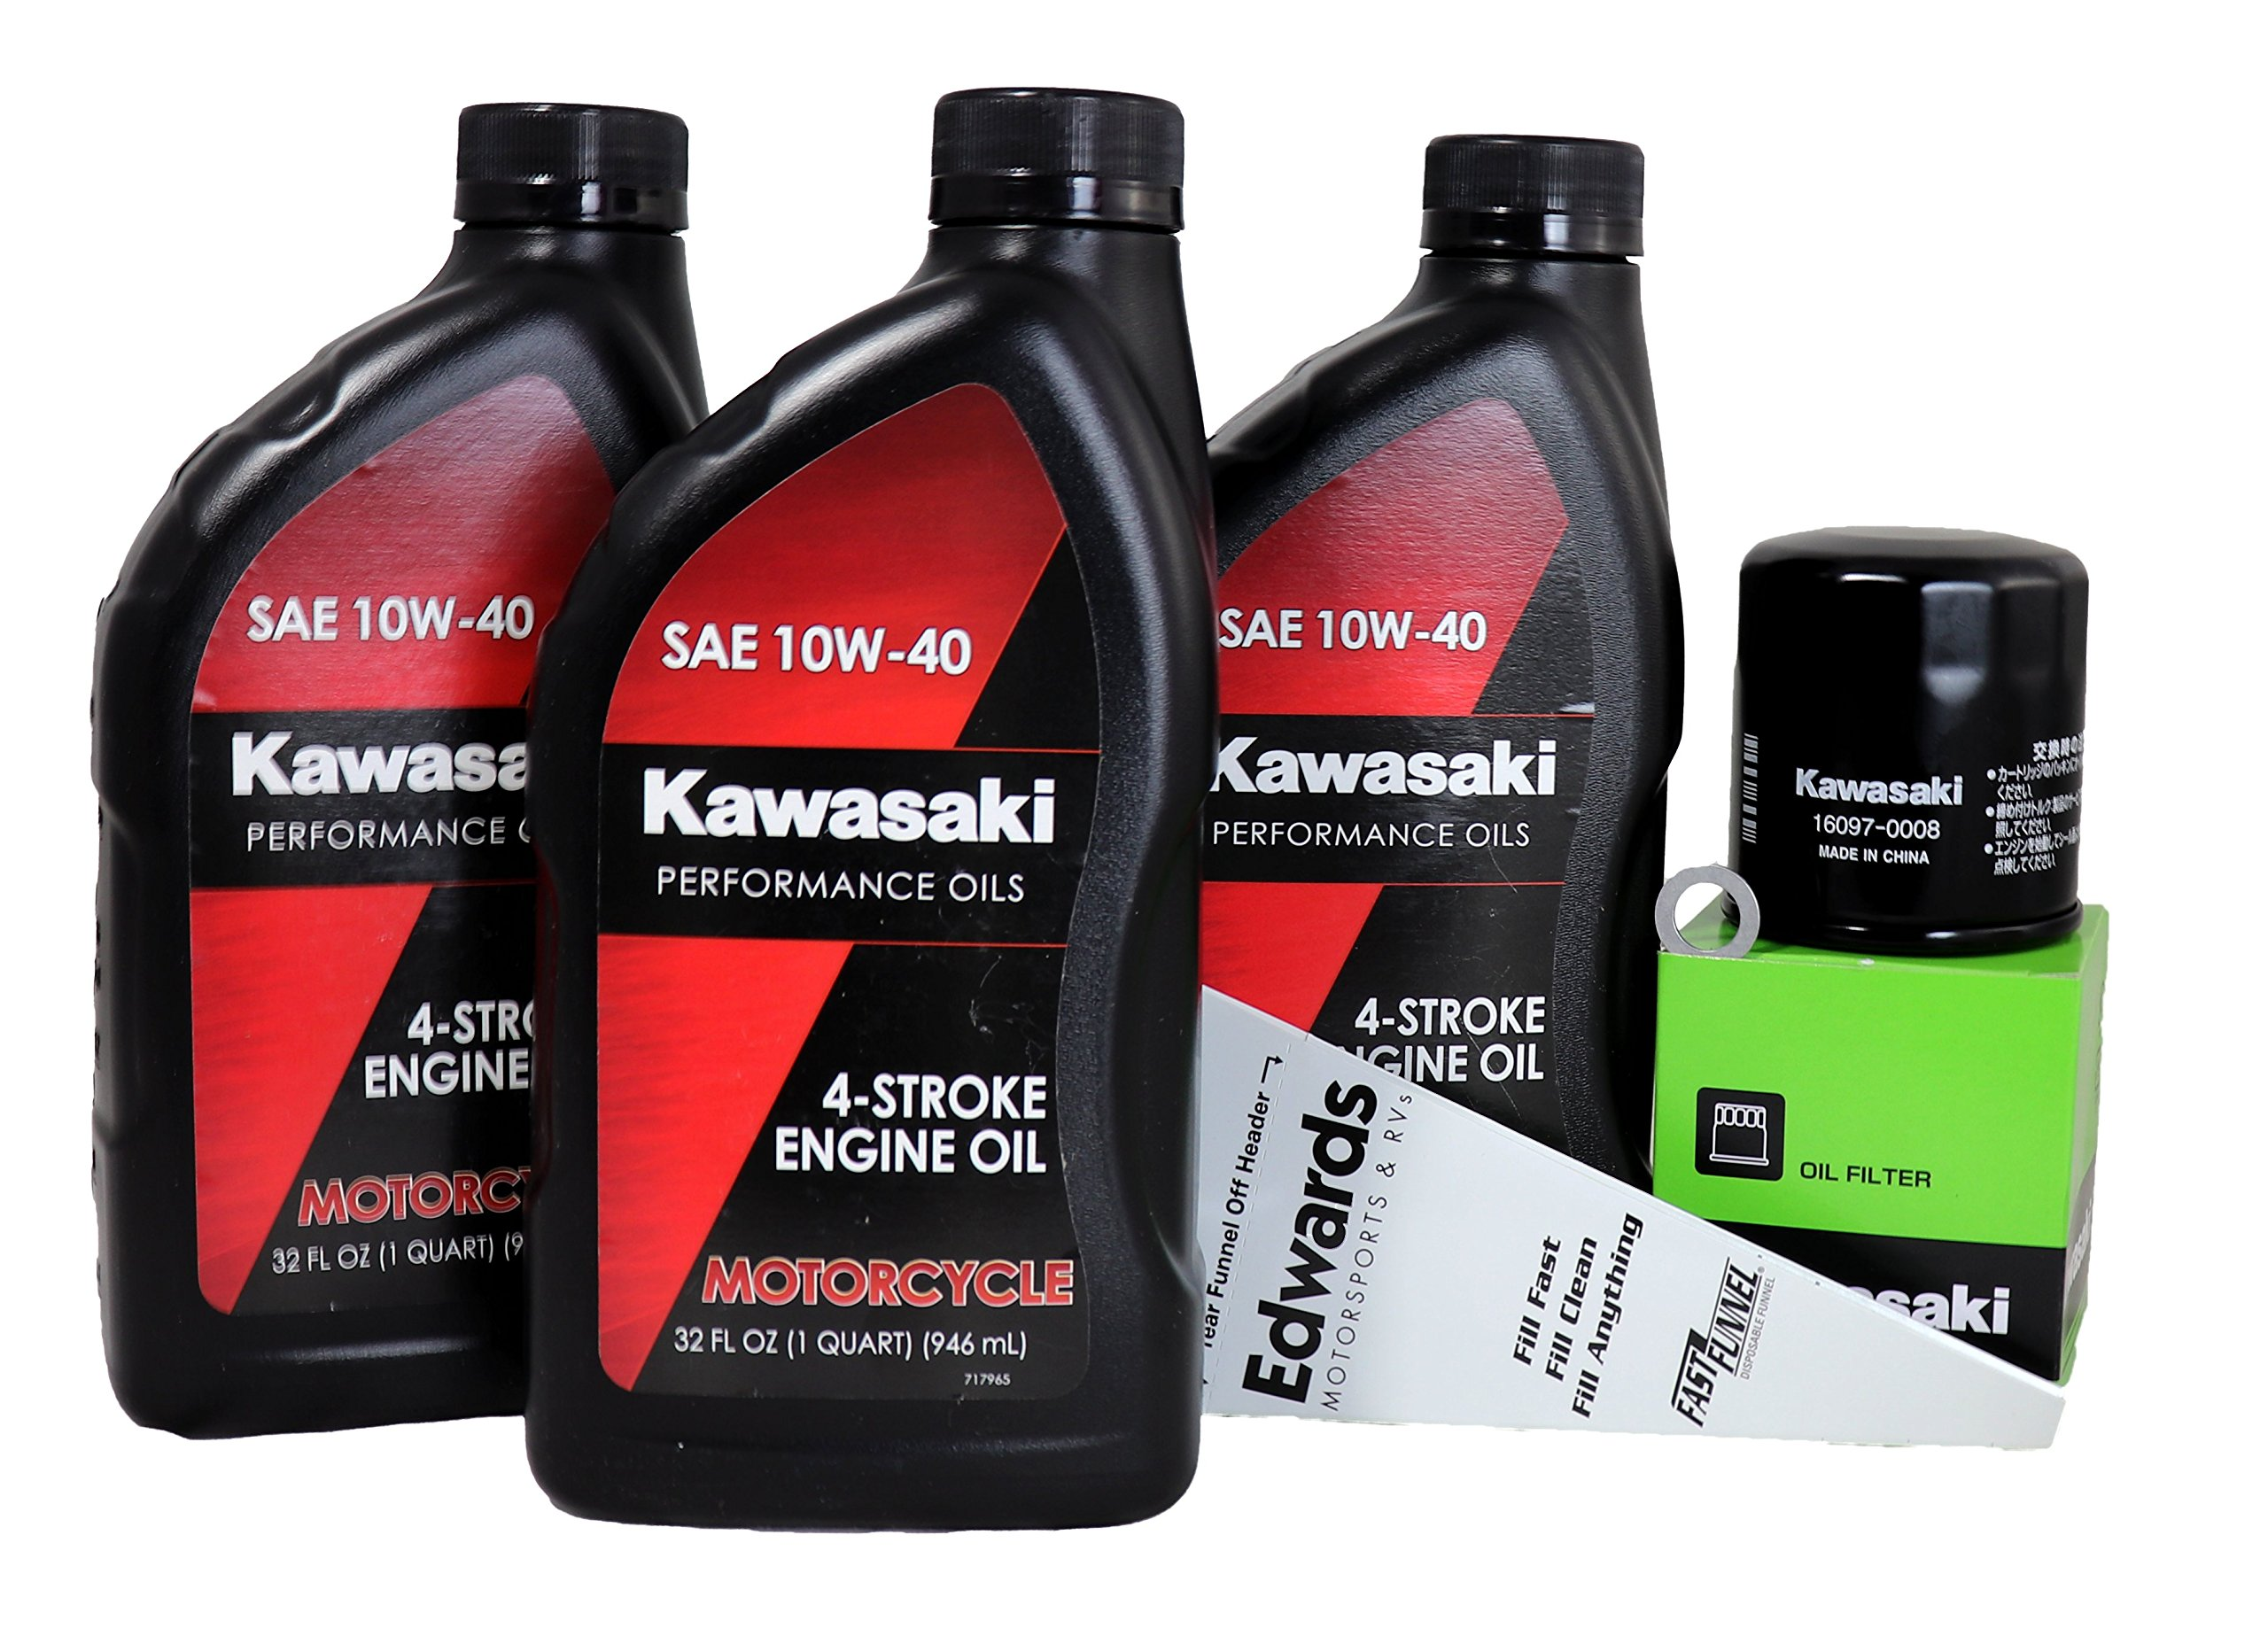 2013 Kawasaki NINJA 300 Oil Change Kit product image